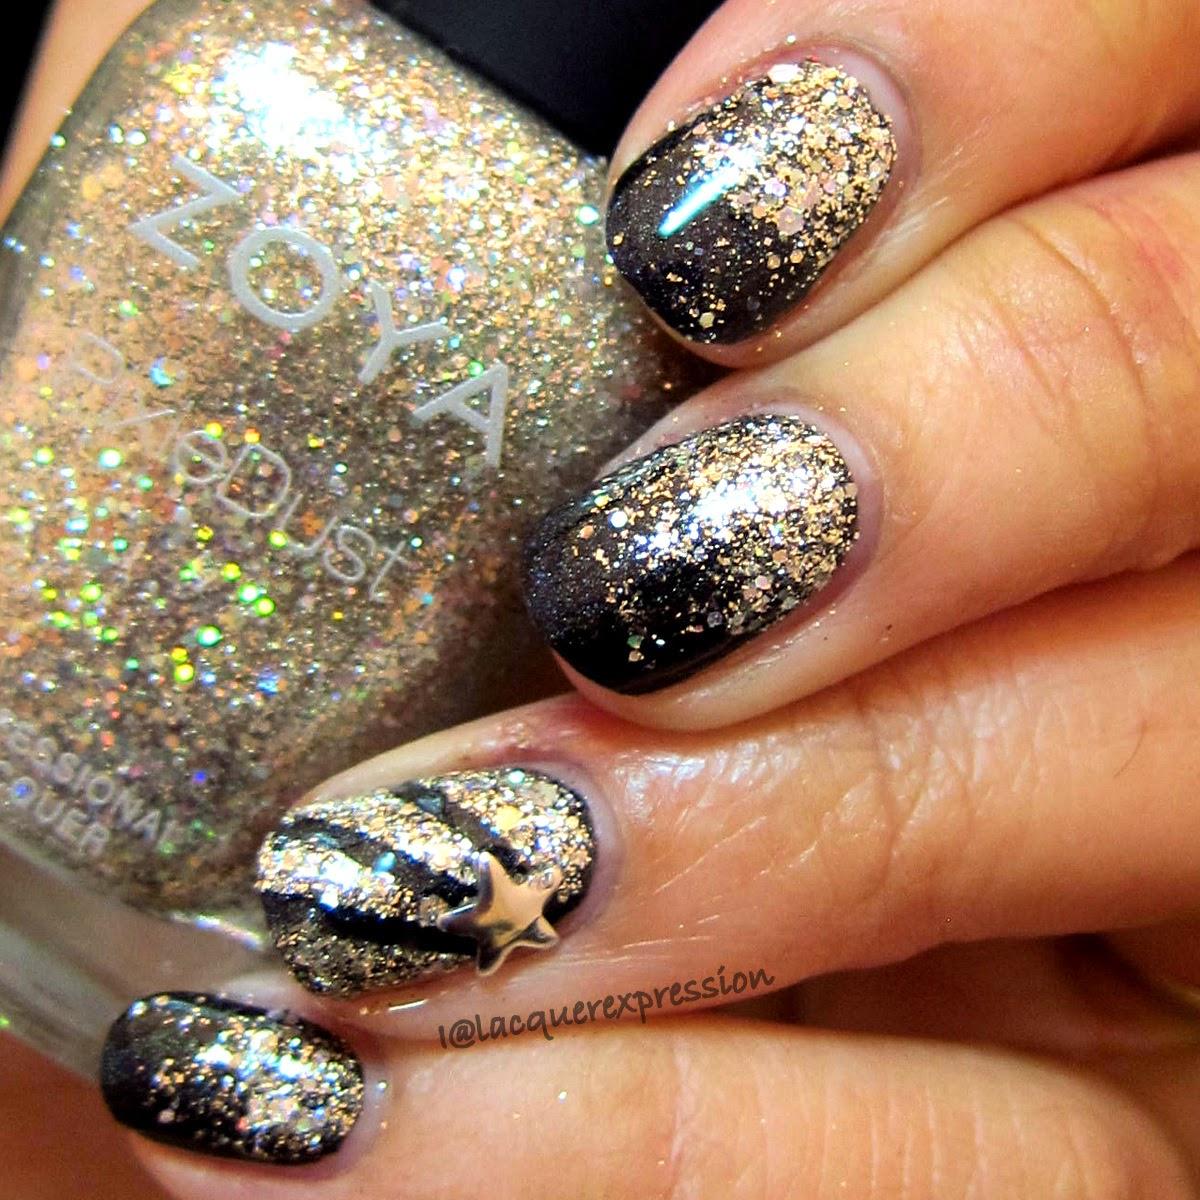 Glitter gradient using Zoya Cosmo over Bear Pawlish Supernatural